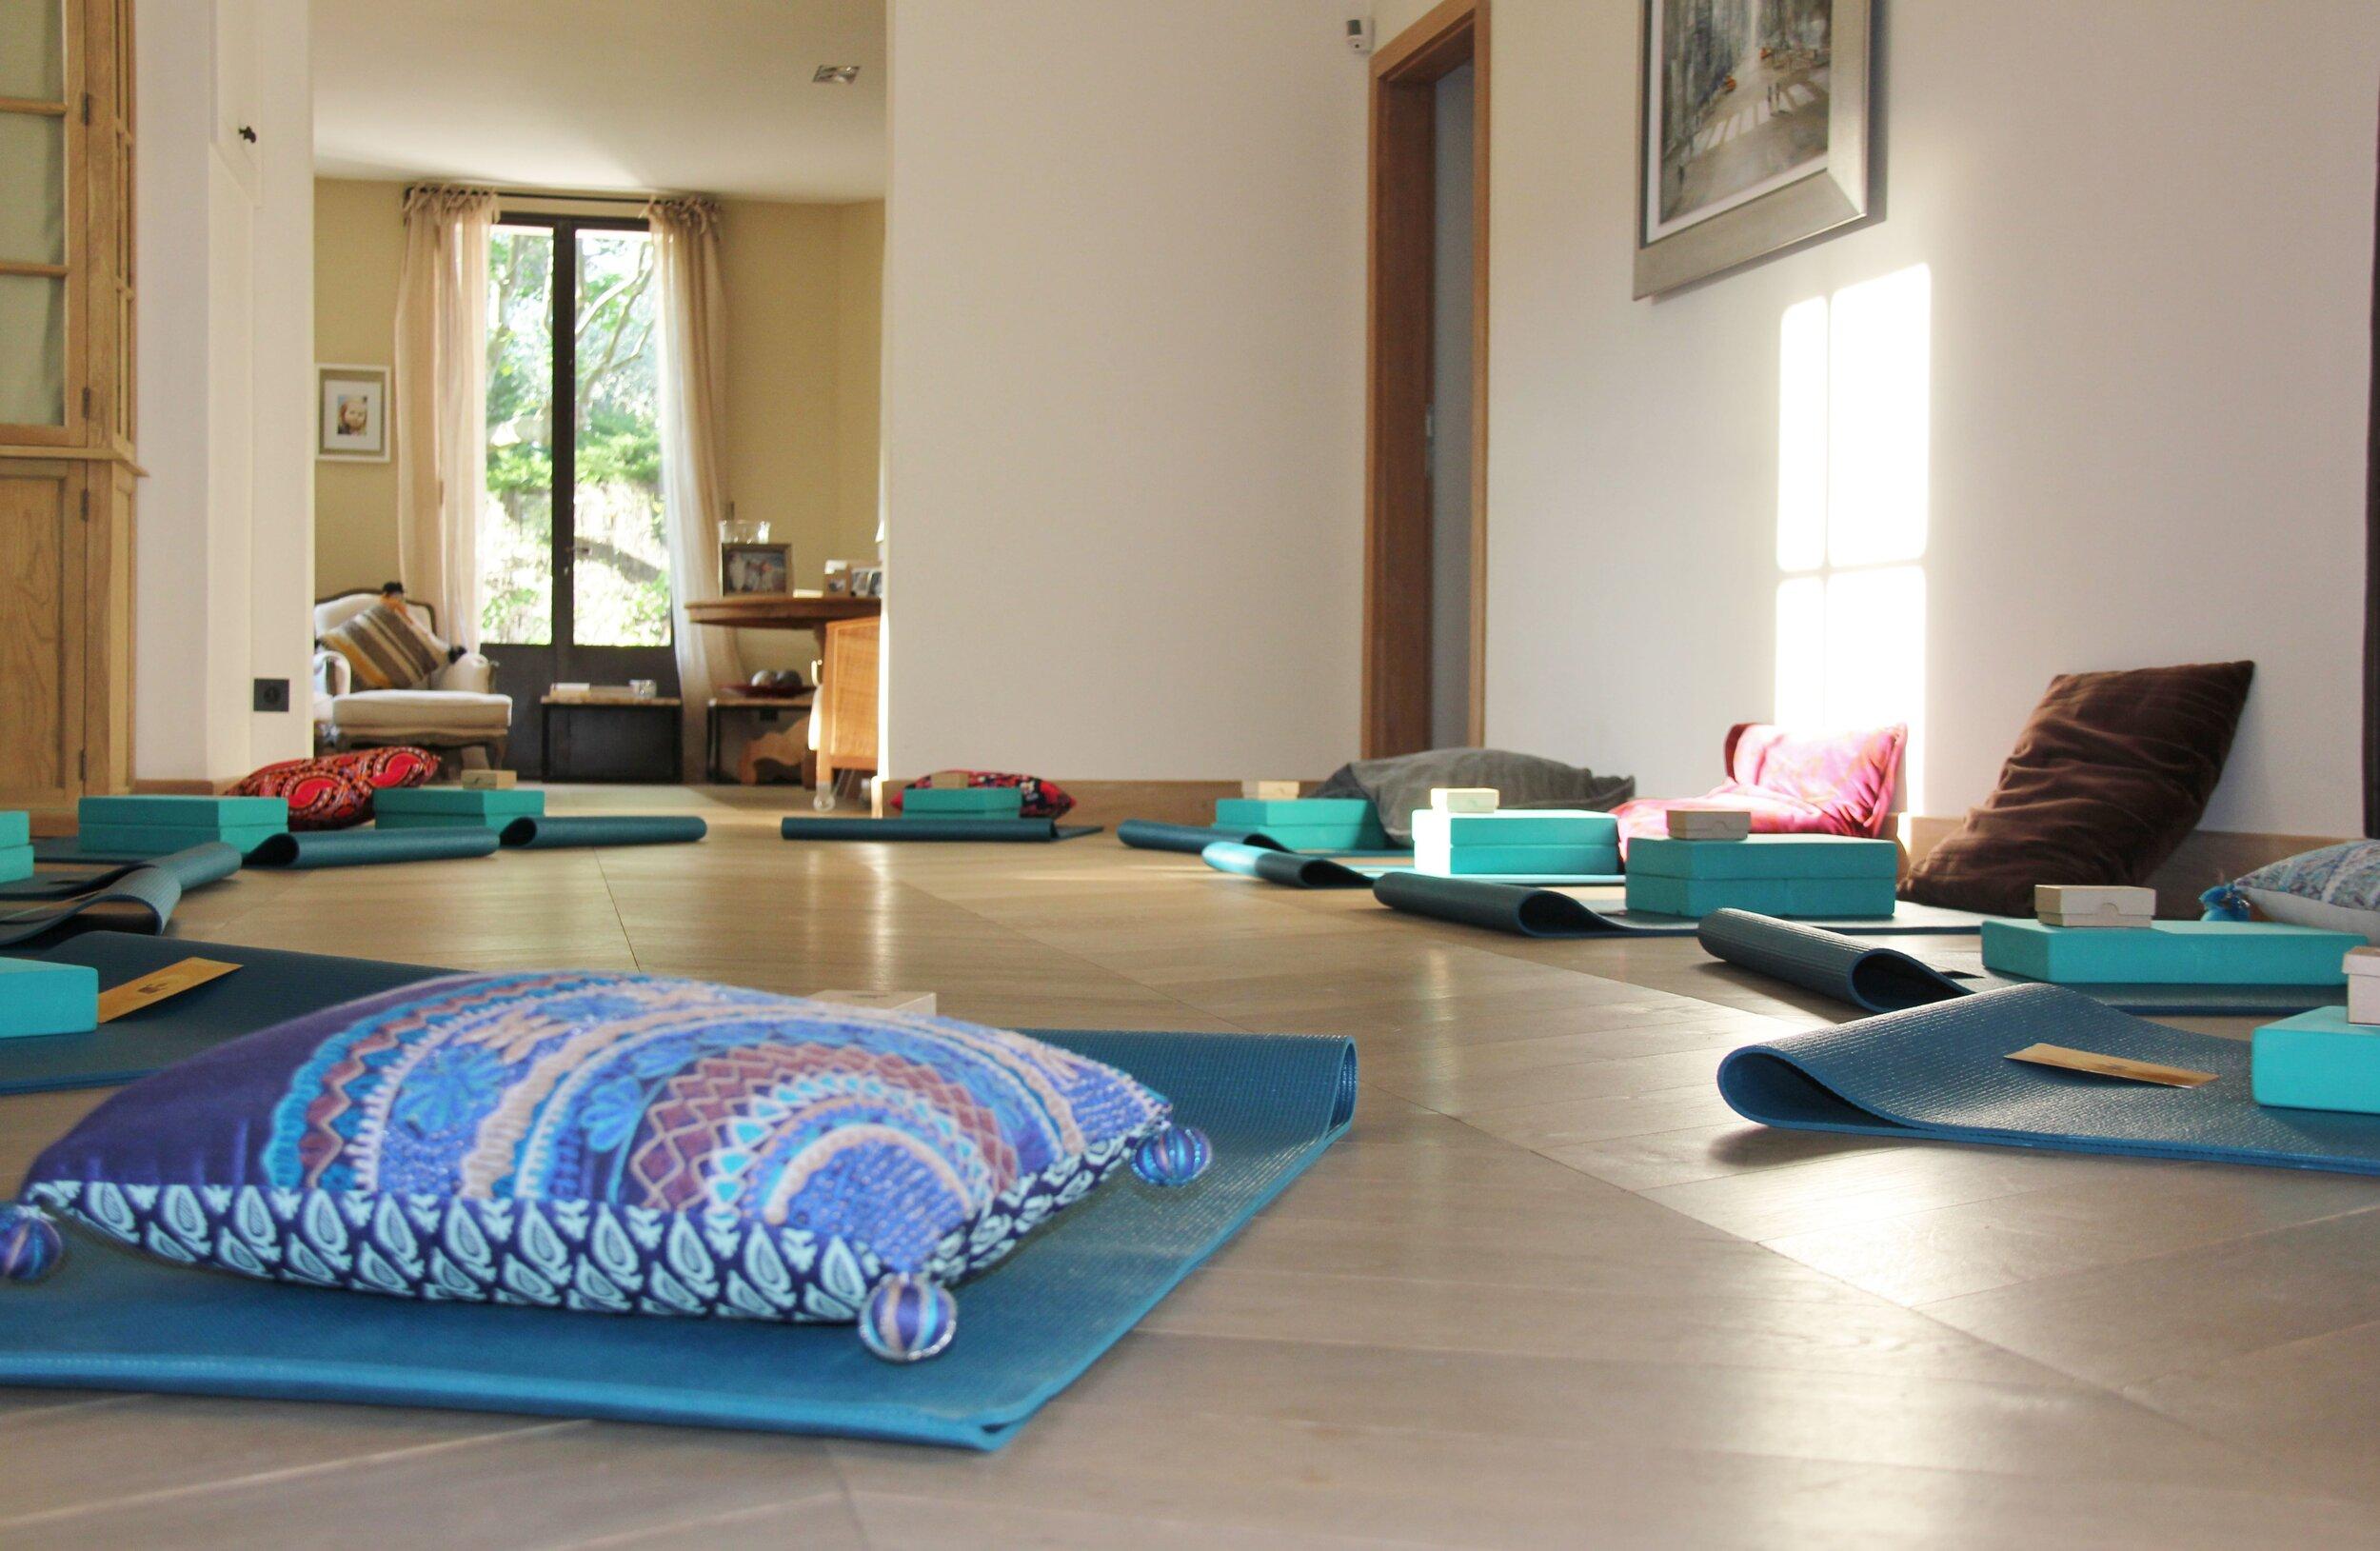 QOYA FRIDAYS - QOYA FRIDAYS at South Coast Yoga1-2.30pmSouth Coast Yoga, Penn Hill Ave, Poole, Dorset.Open to all women every Friday, book via the MindBody App or visit The Yoga Shala.